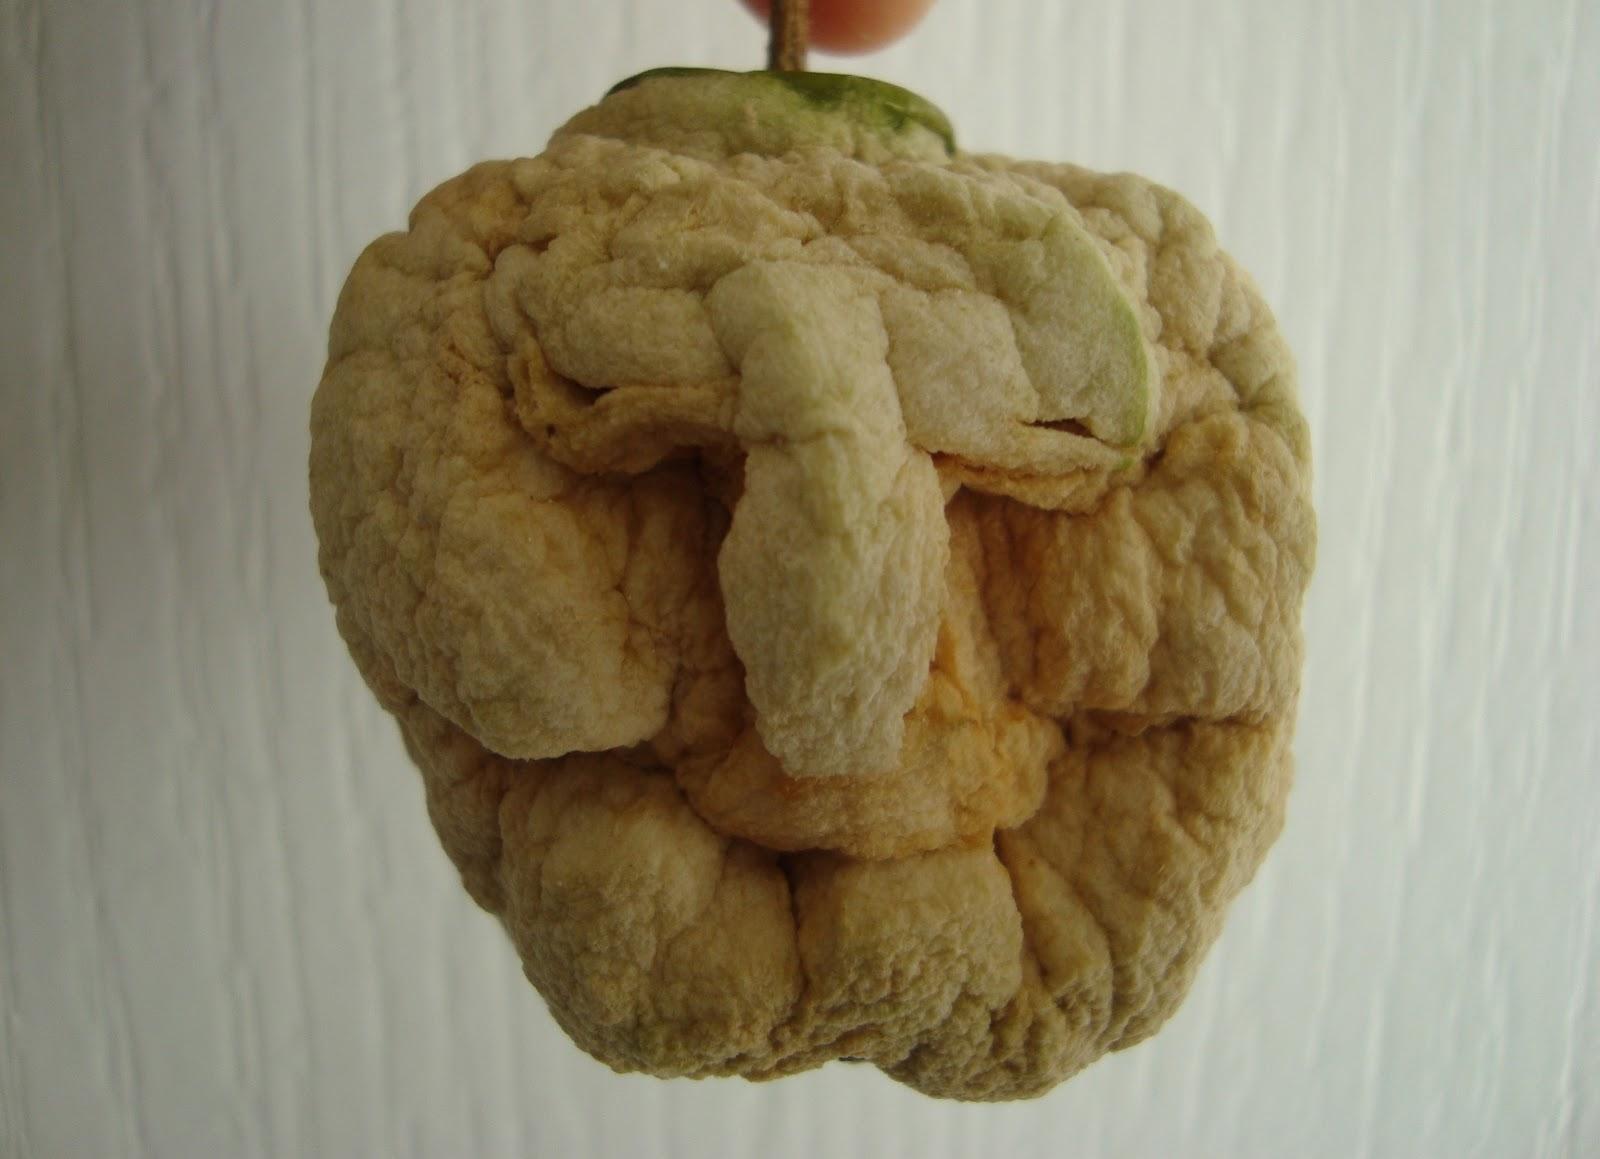 Shrunken Apple Head Doll Apple Dolls as Shrunken Heads